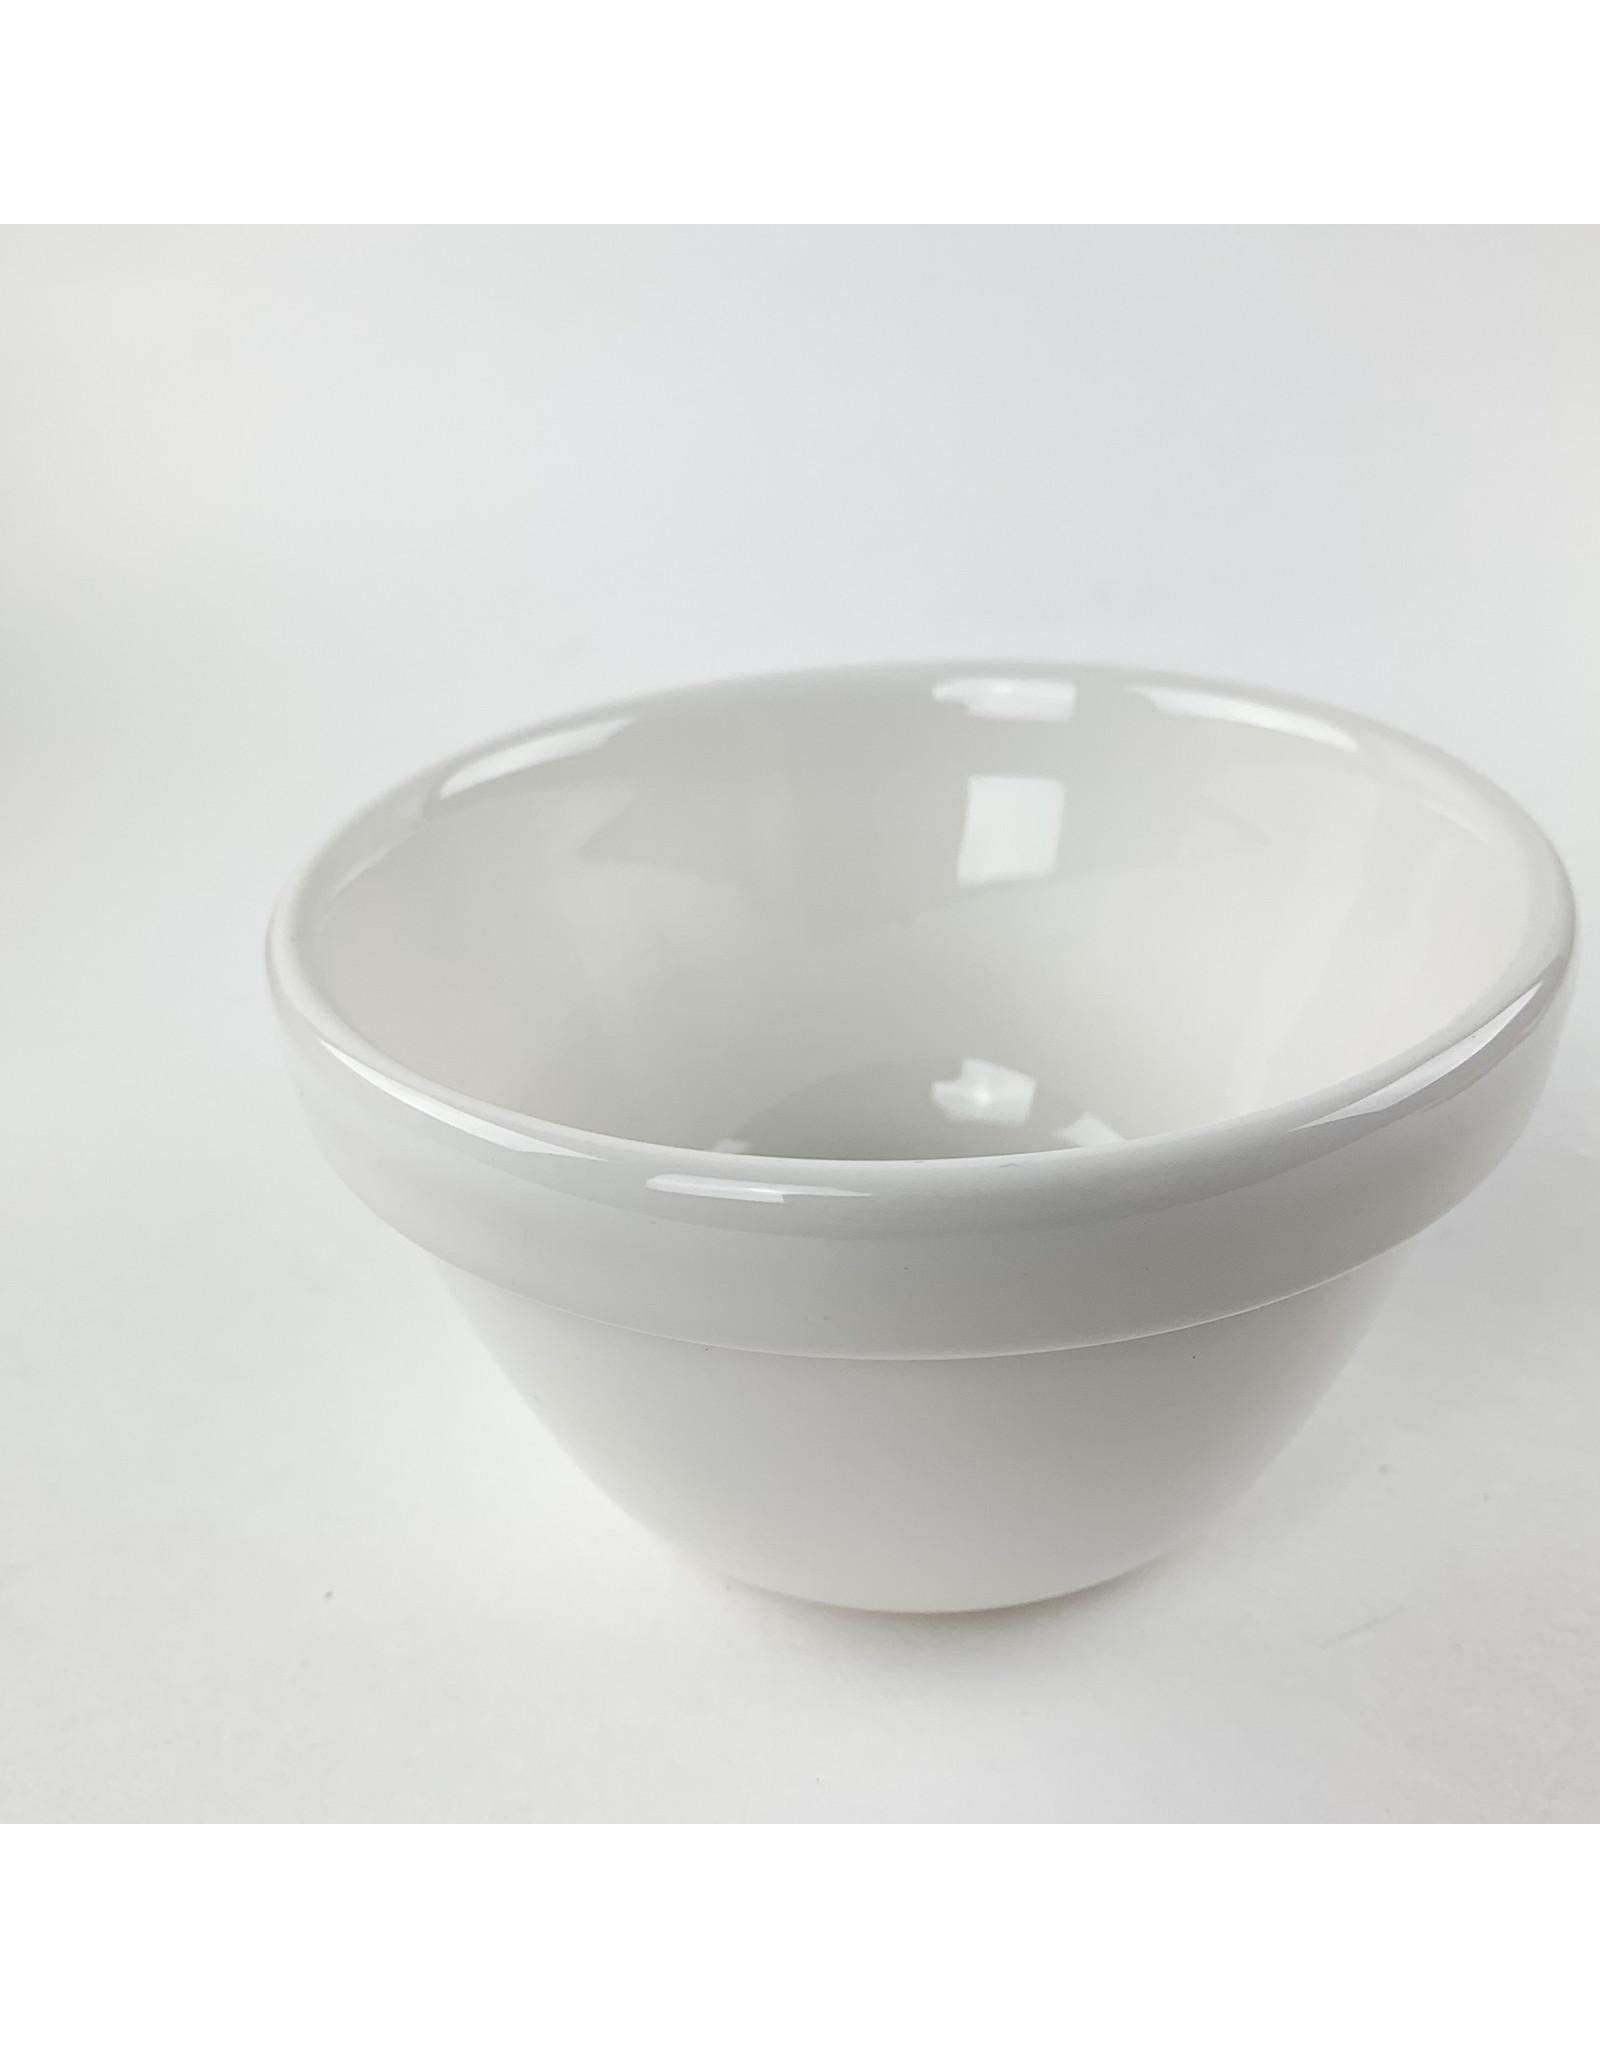 Typhoon Homewares All Purpose Bowl 5 Inch